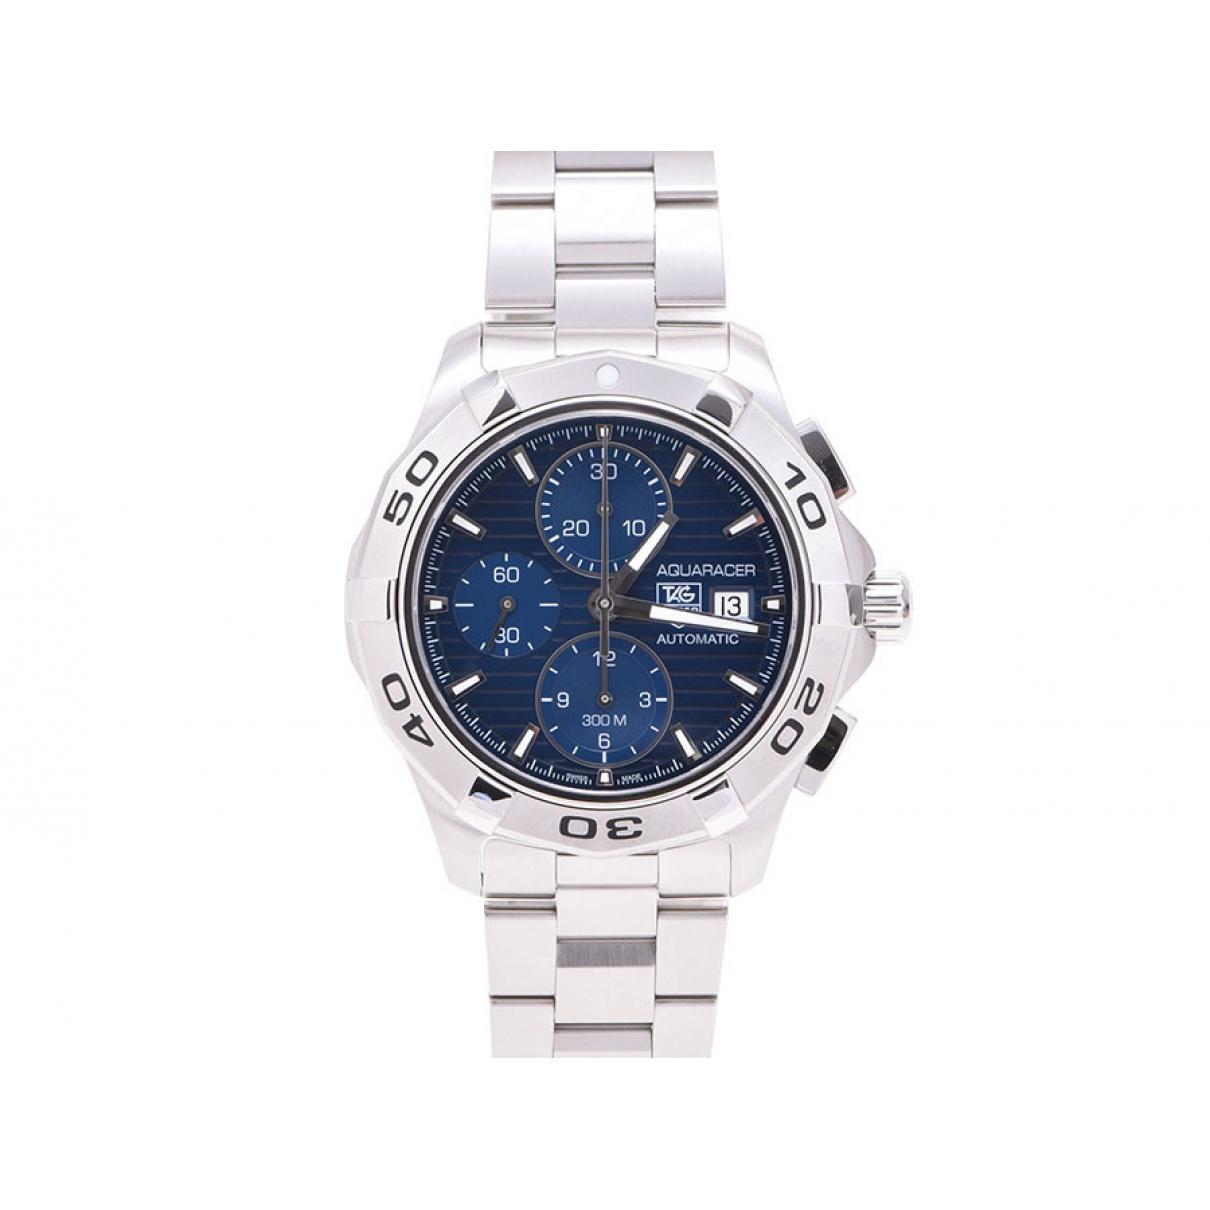 Relojes Aquaracer  Tag Heuer